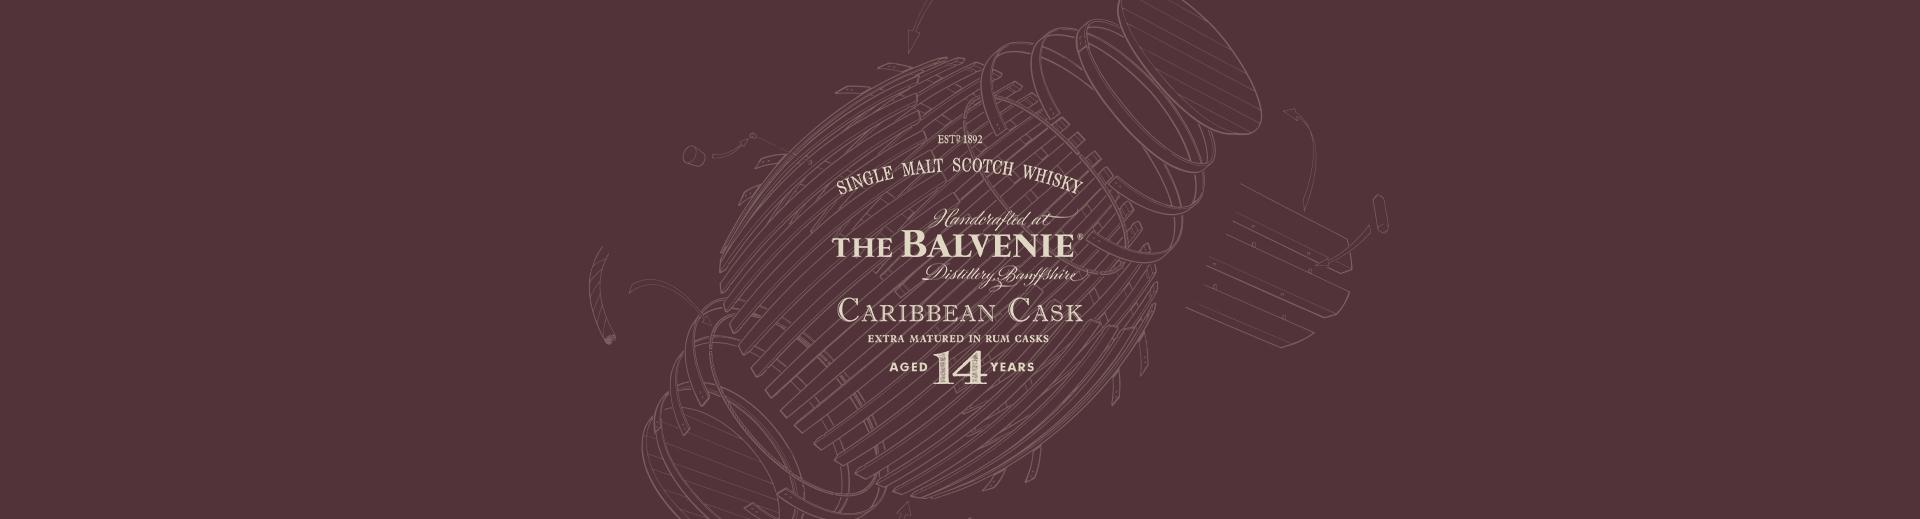 The Balvenie